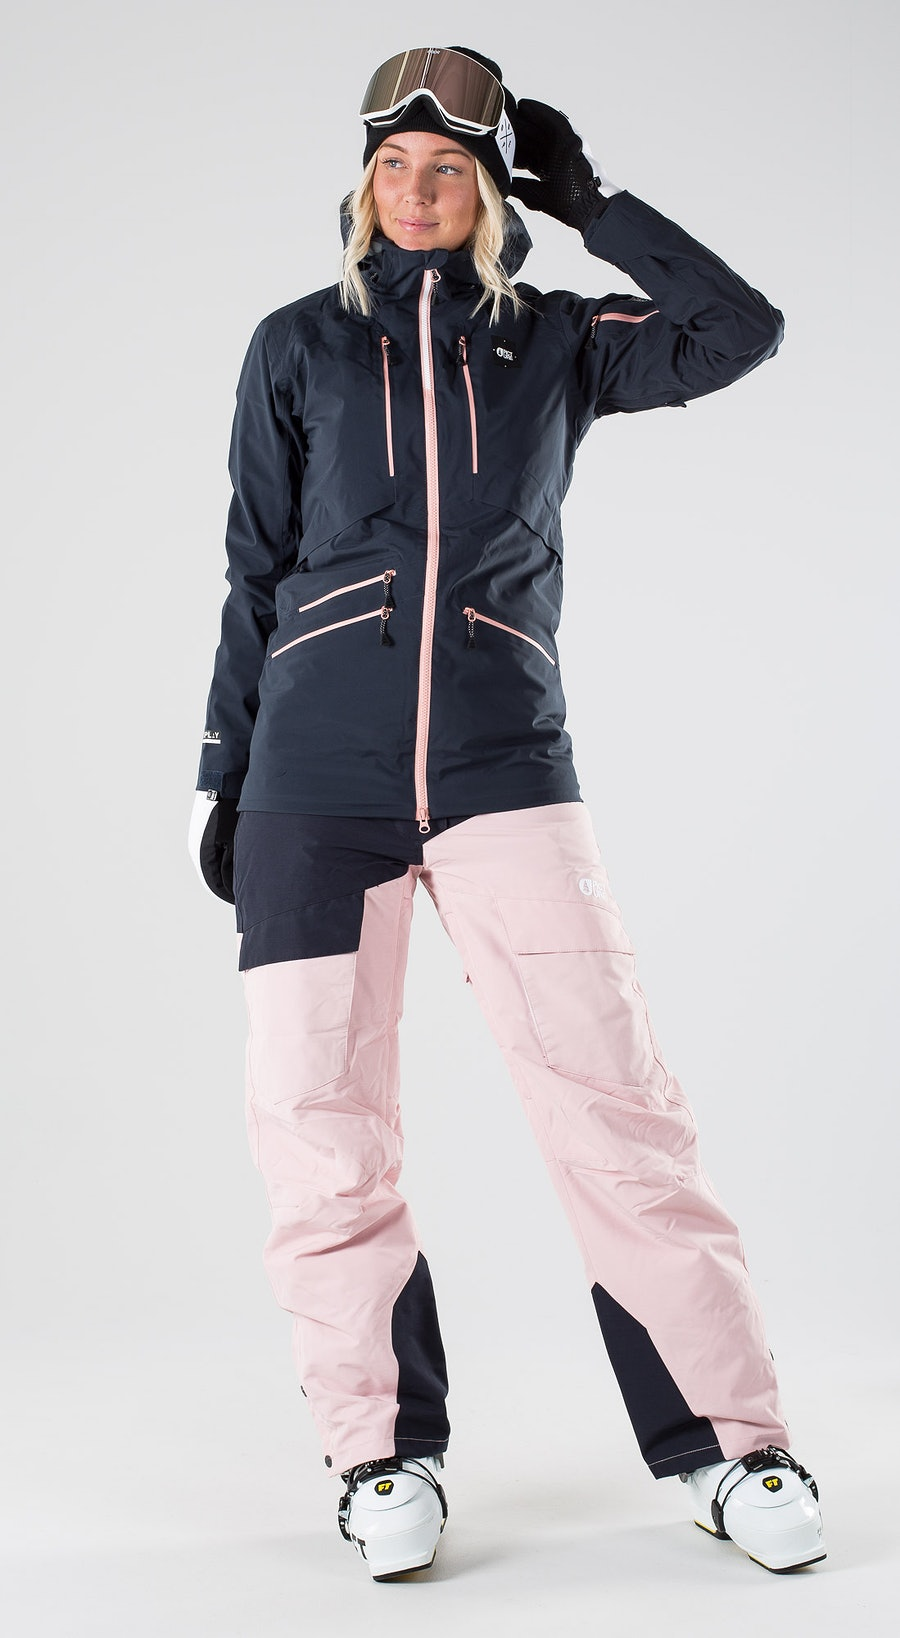 Picture Haakon Dark Blue Ski clothing Multi